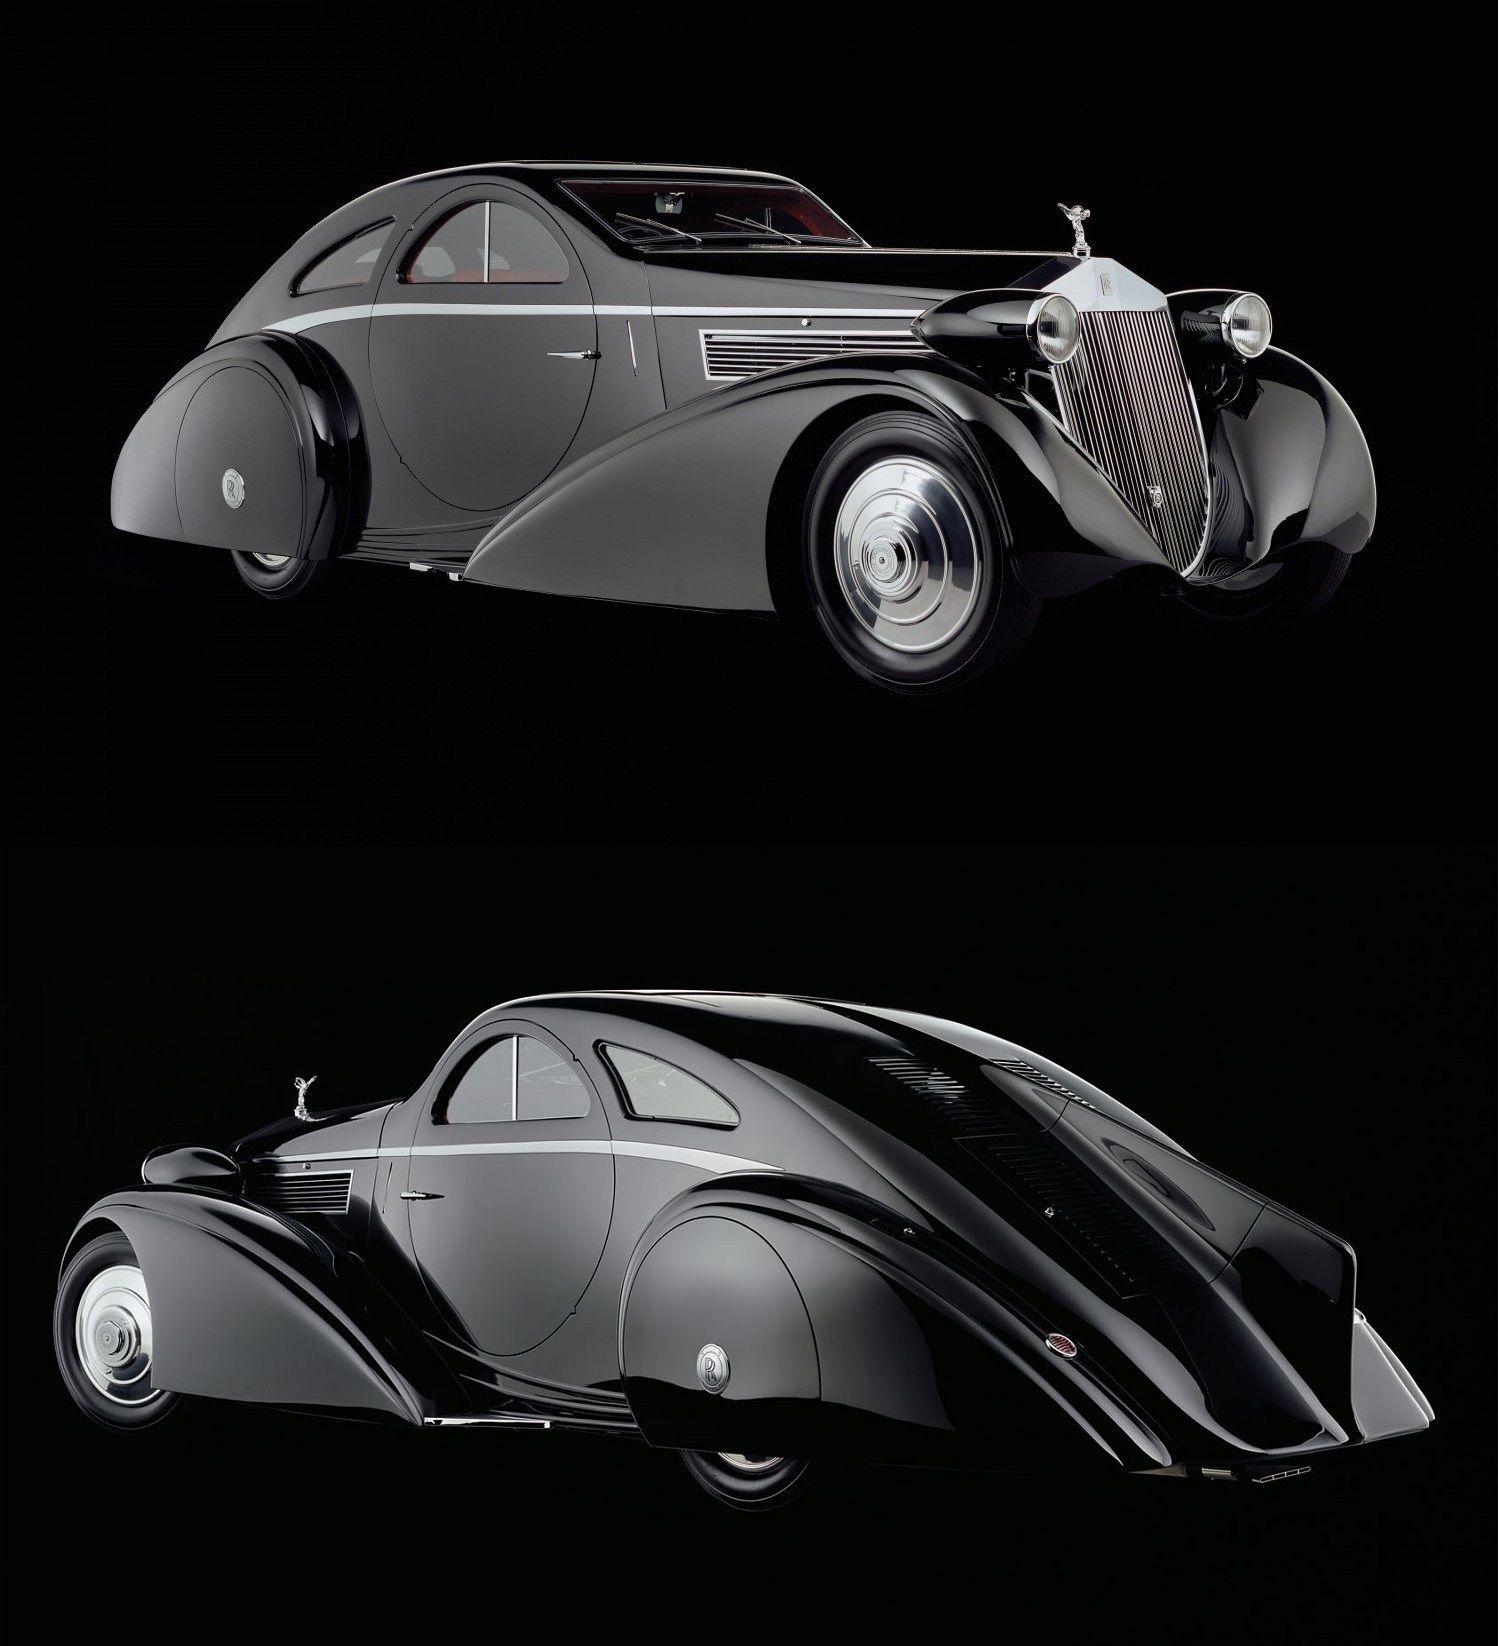 1925 Rolls Royce Phantom >> 1925 Rolls Royce Phantom L All Records From The Factory